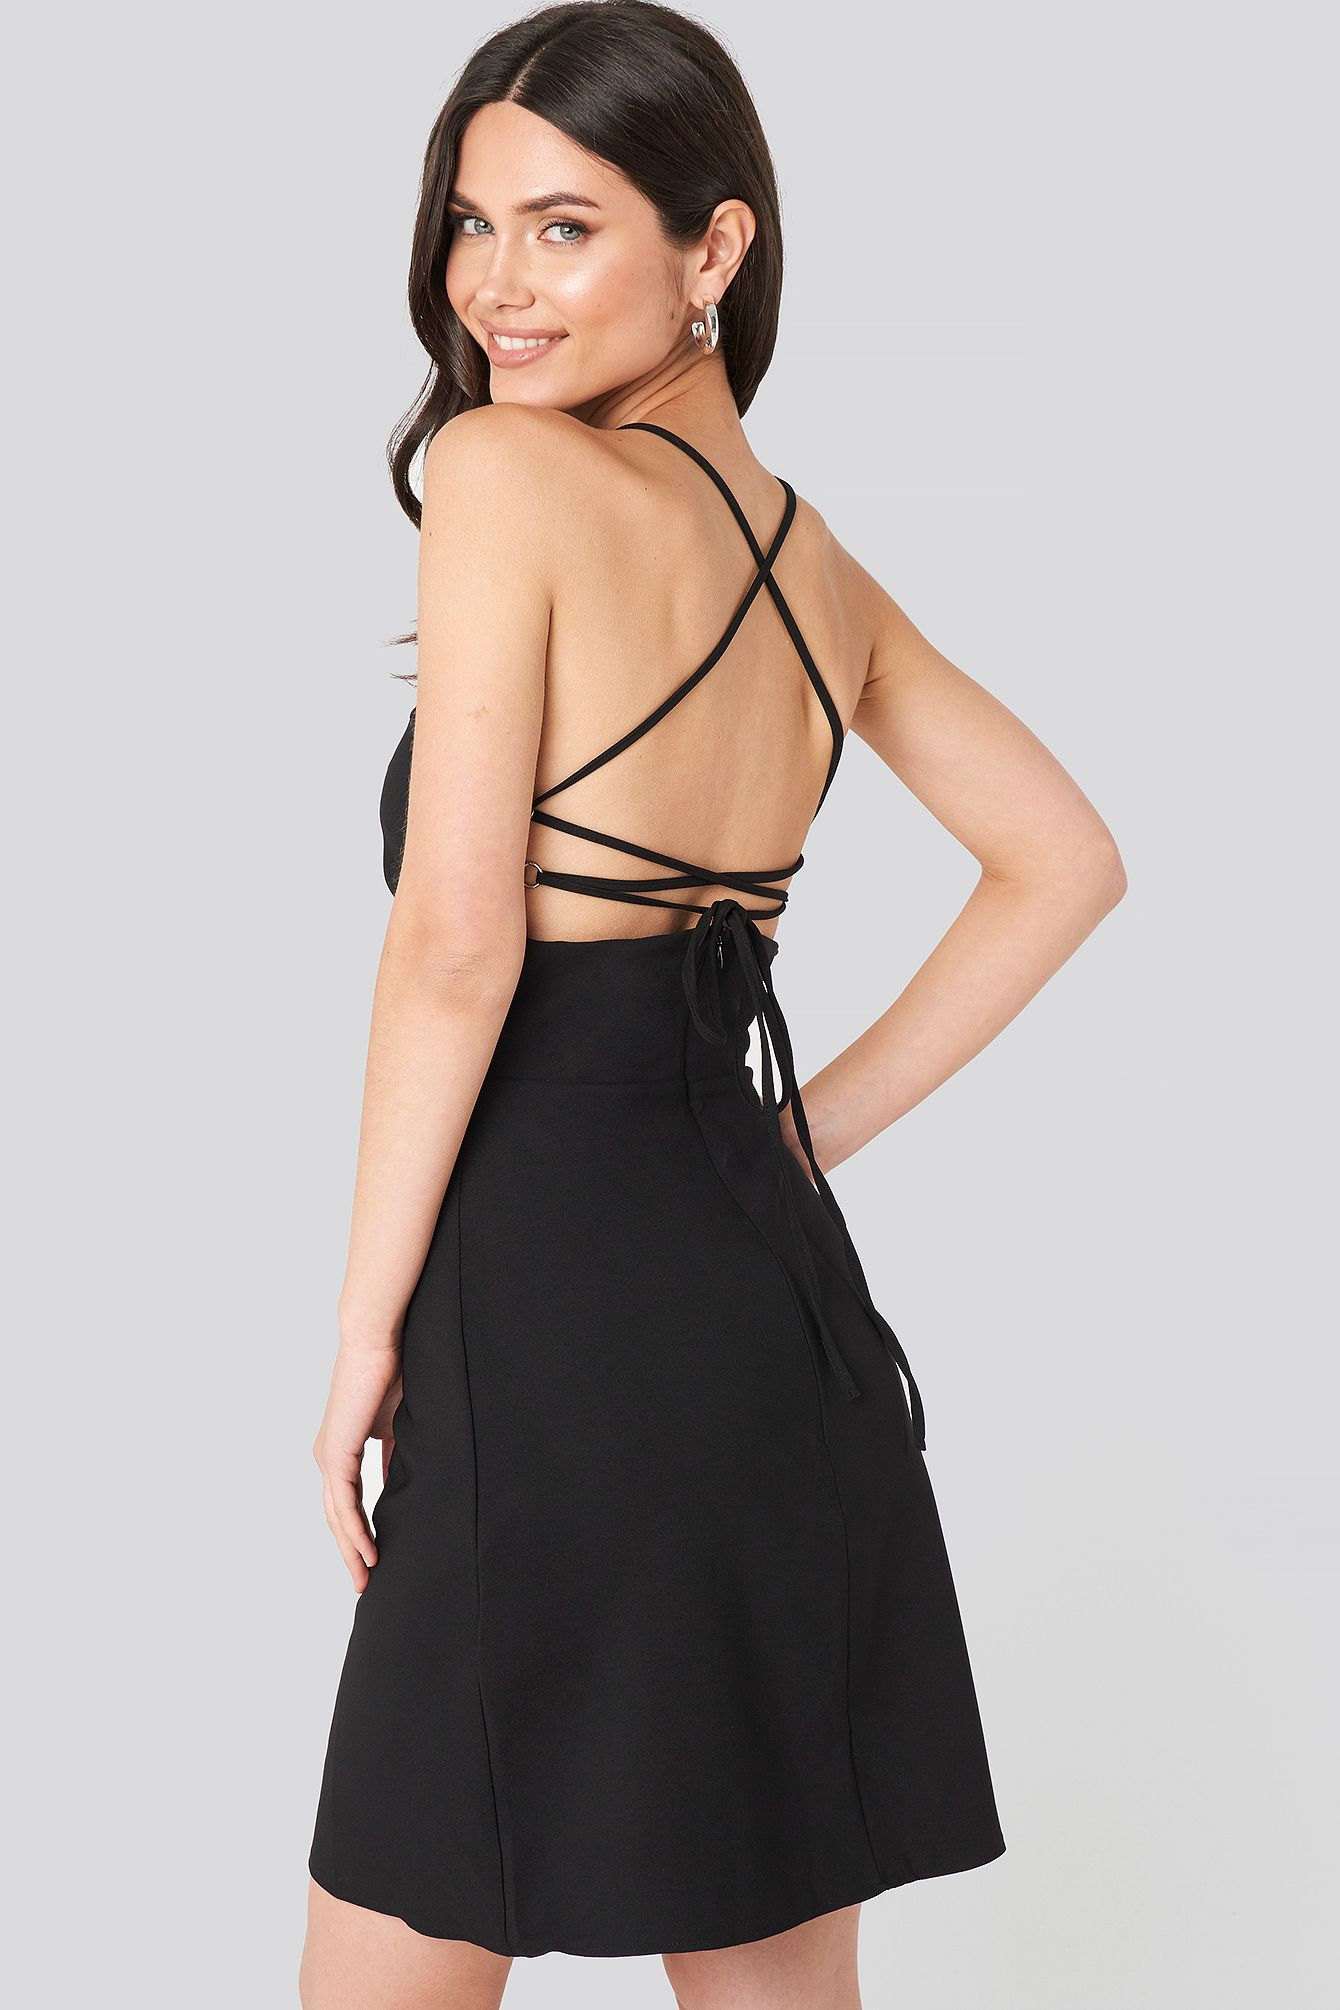 strap back detailed mini dress schwarz in 2020 | minikleid